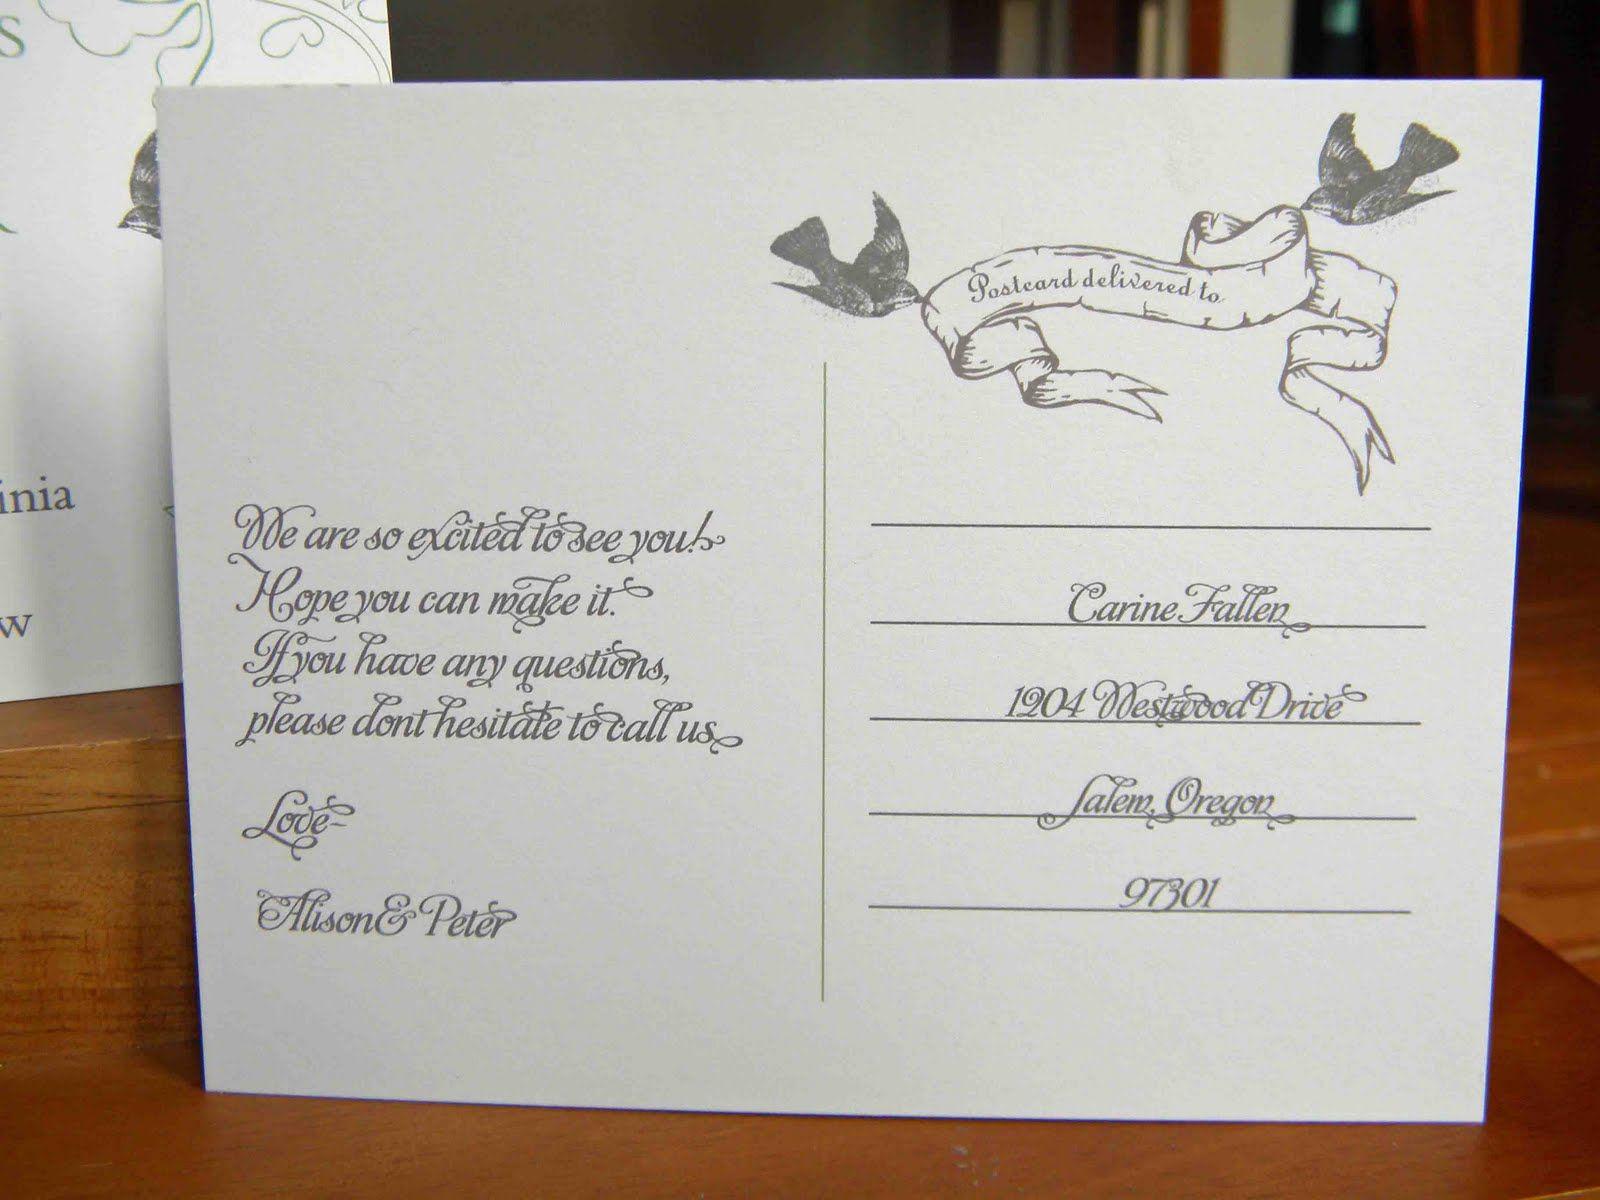 traditional wedding invitations - Google Search | הזמנות חתונה ...